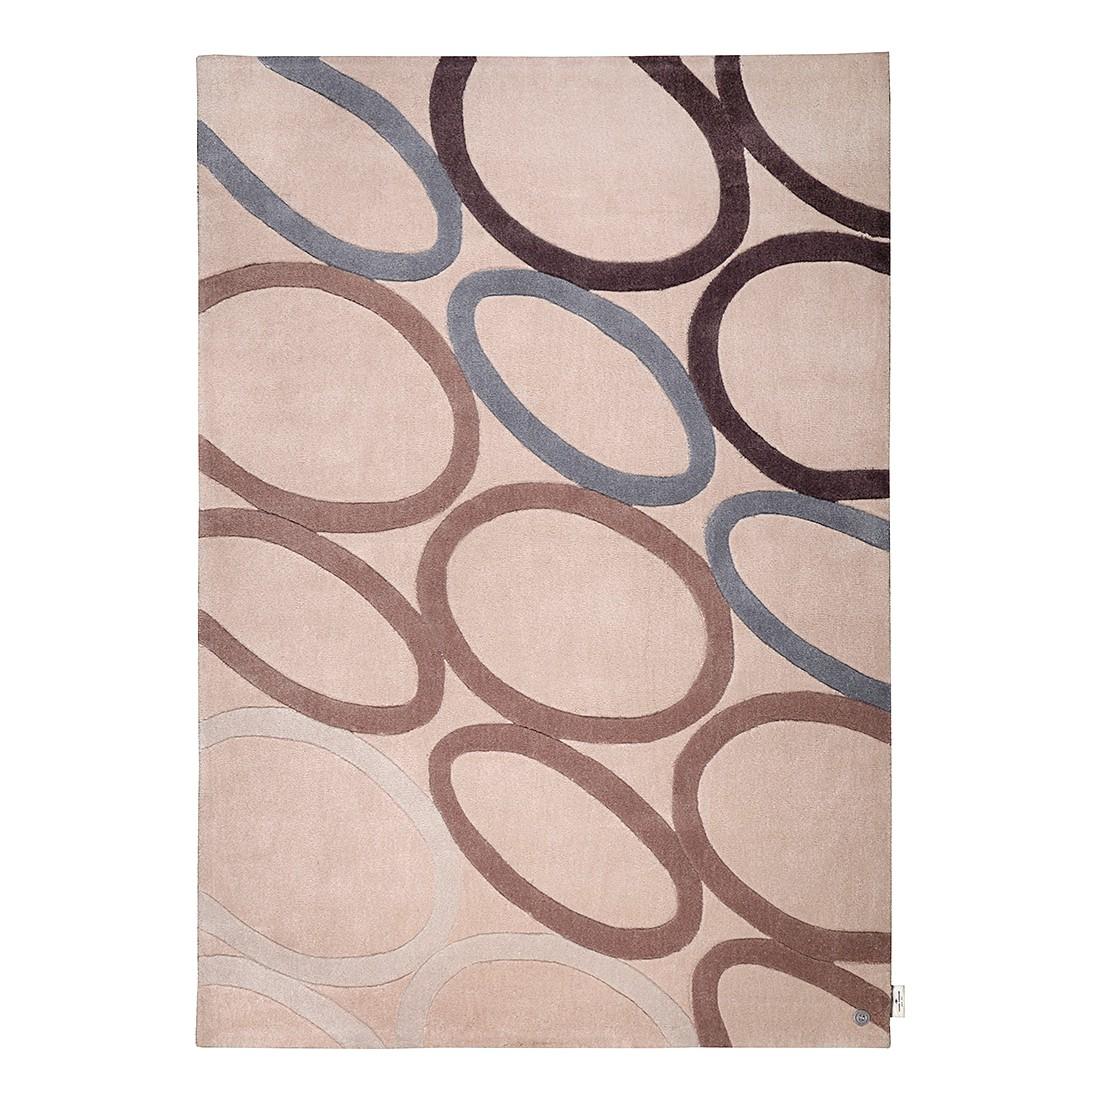 Teppich Life Oval – Beige – Maße: 160 x 230 cm, Tom Tailor jetzt bestellen